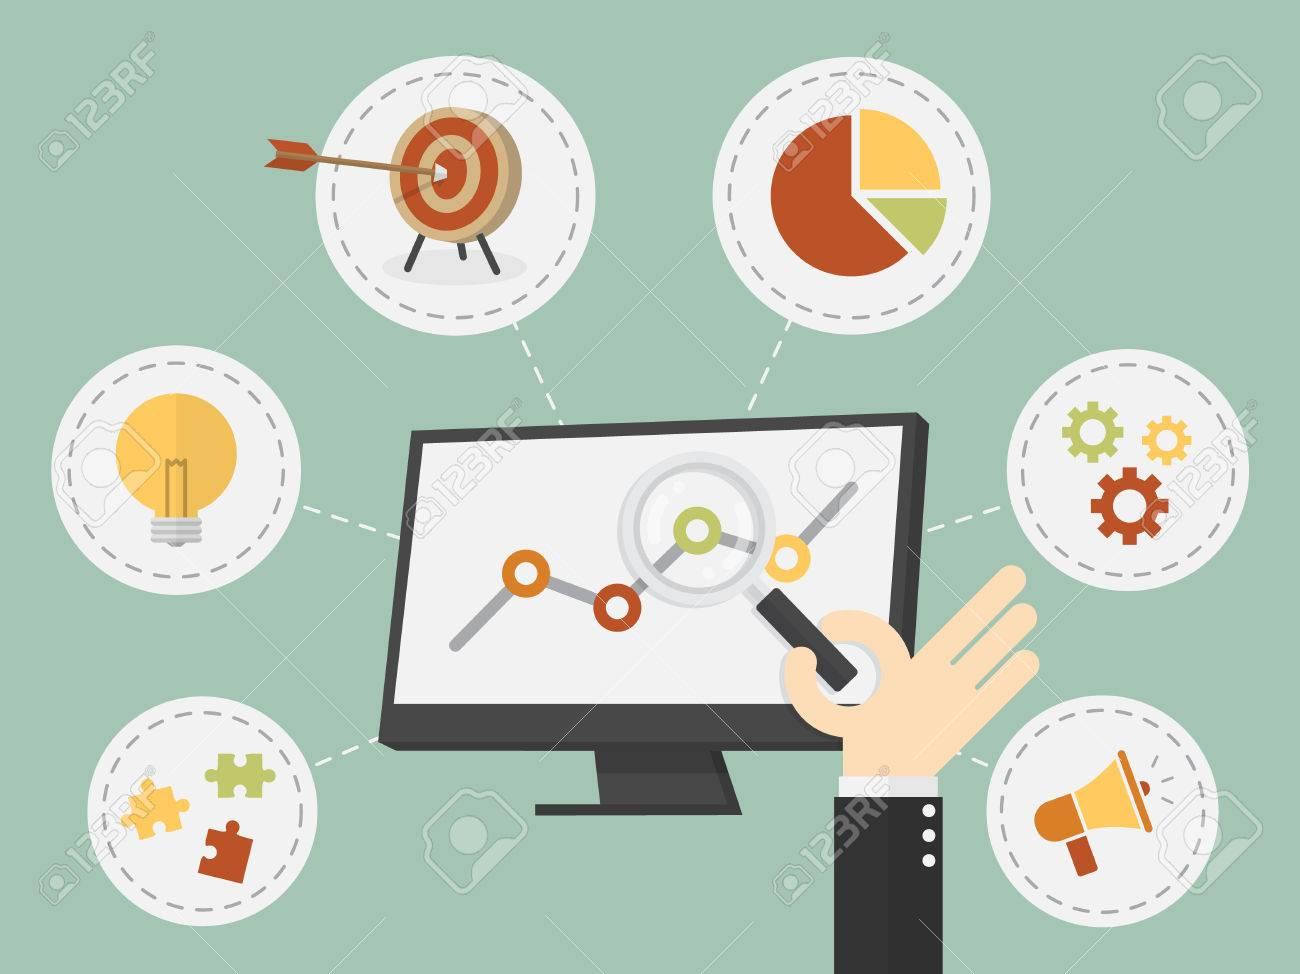 Flat design vector illustration business analysis, SEO - 54429117